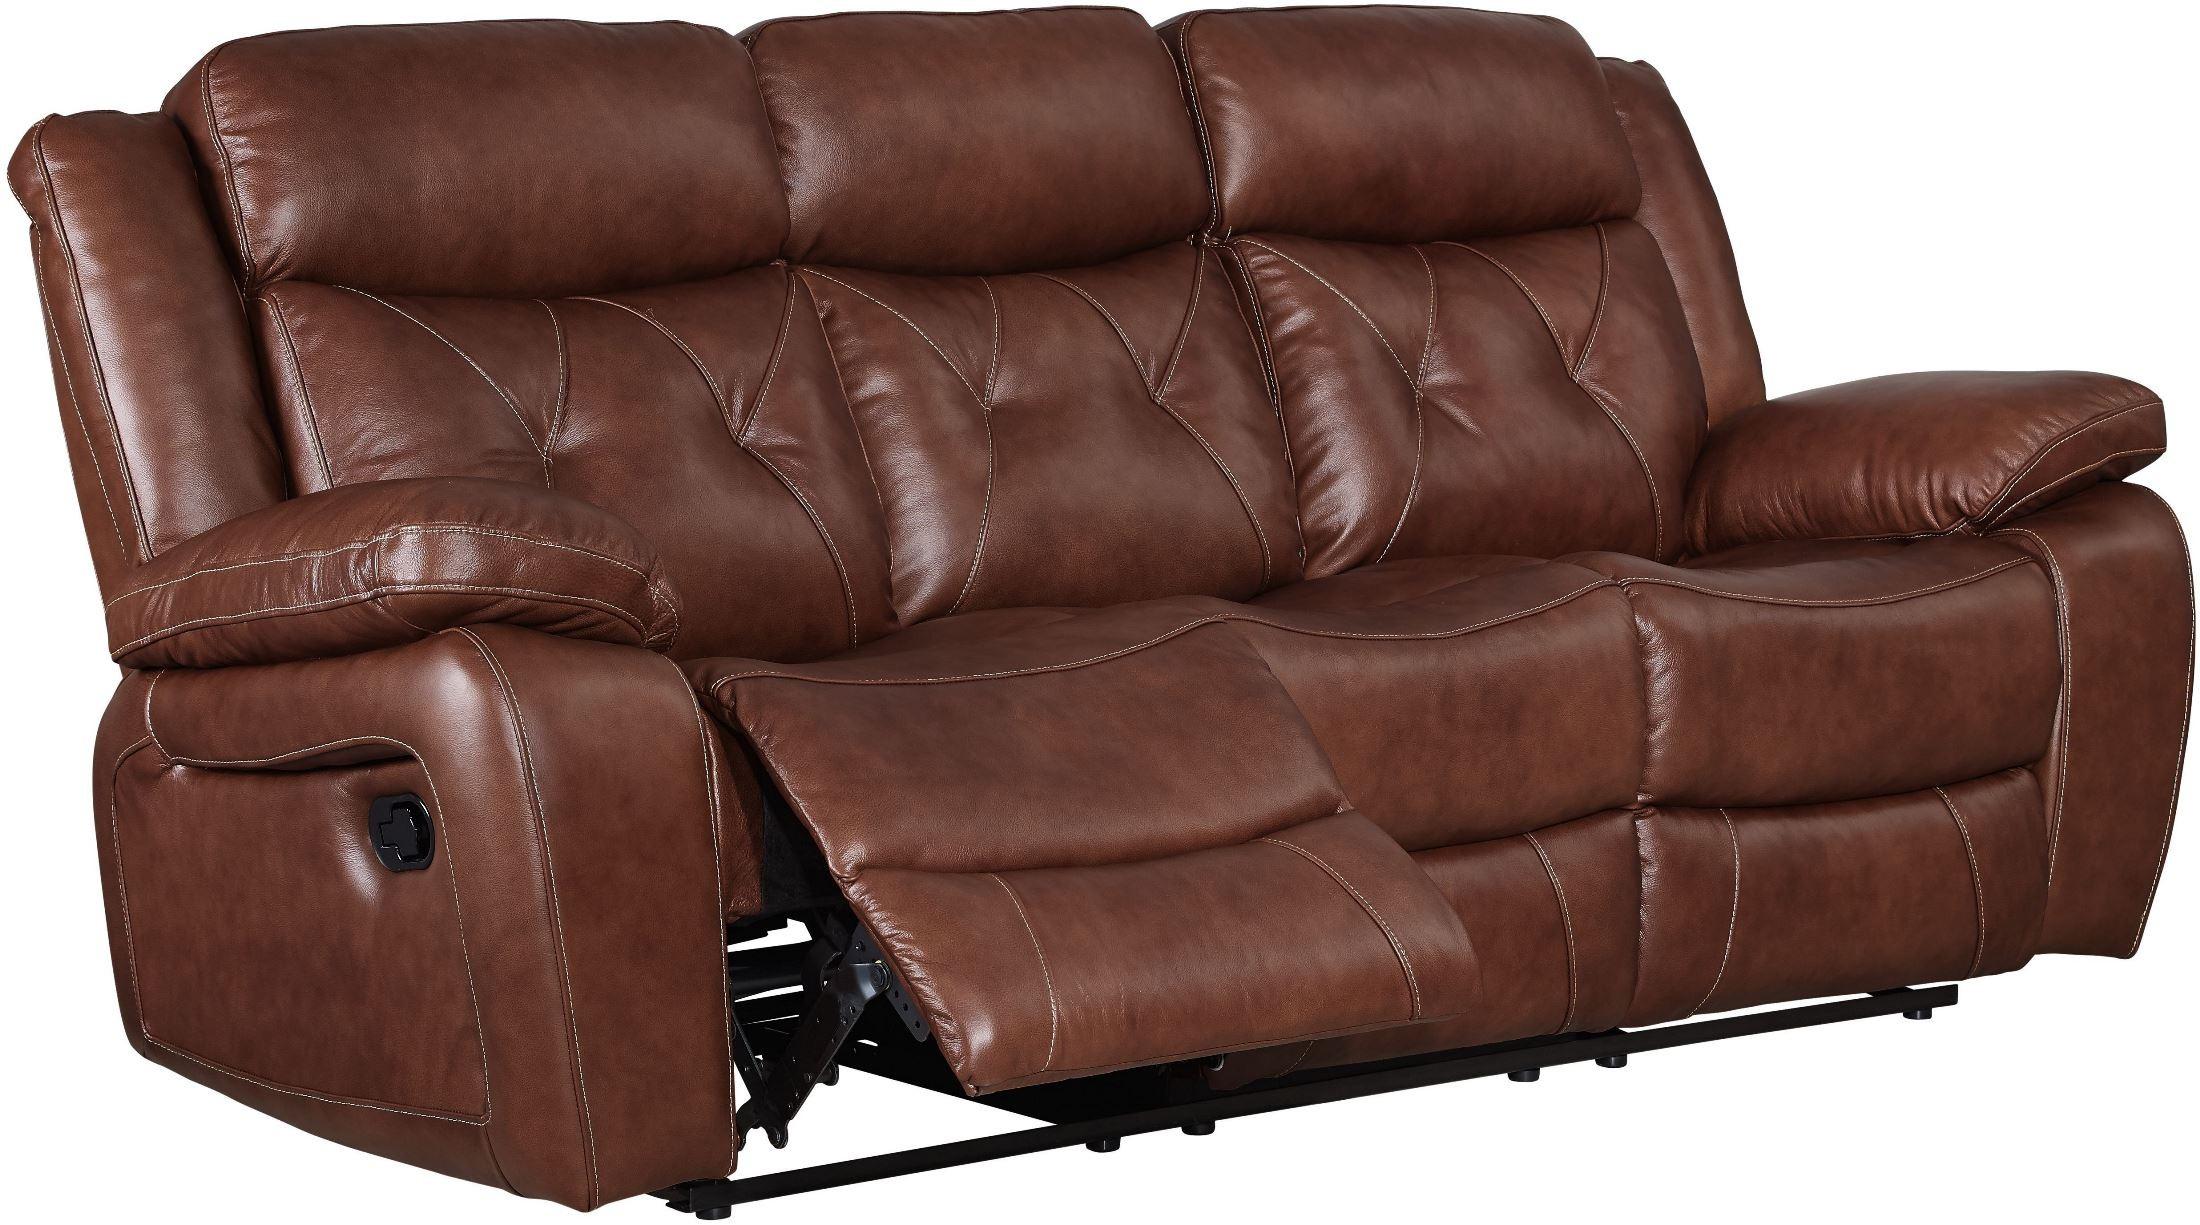 Sensational Benedict Light Brown Power Reclining Sofa Andrewgaddart Wooden Chair Designs For Living Room Andrewgaddartcom